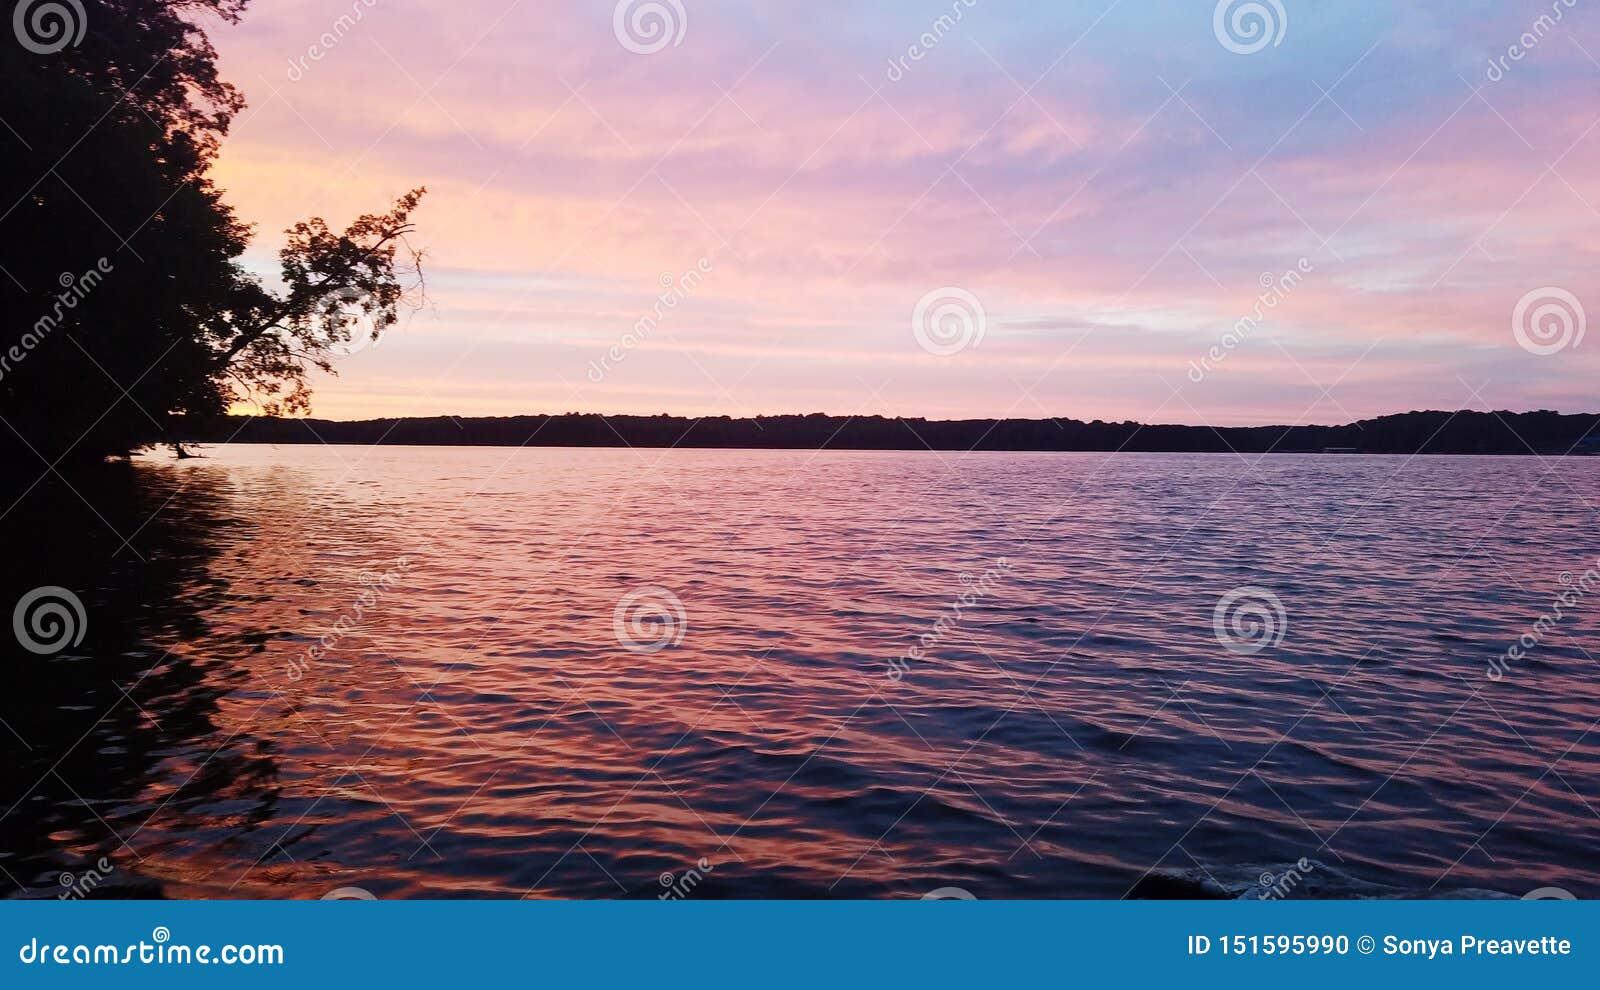 Mesmerizing water pink summertime relaxing